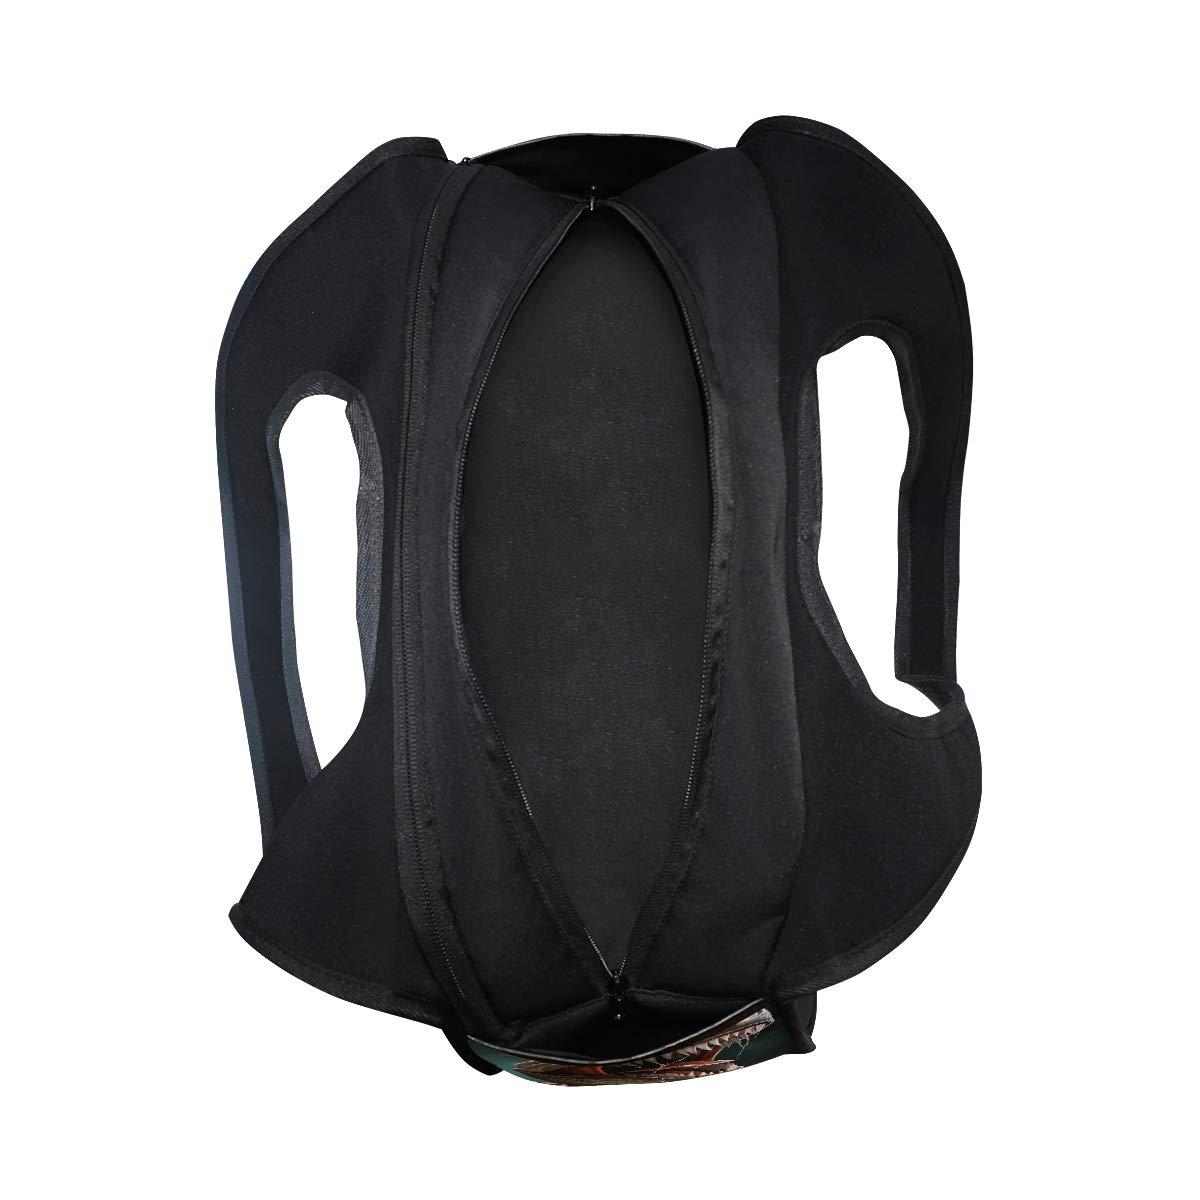 Tyrannosaurus Rex Pattern Women Sports Gym Totes Bag Multi-Function Nylon Travel Shoulder Bag